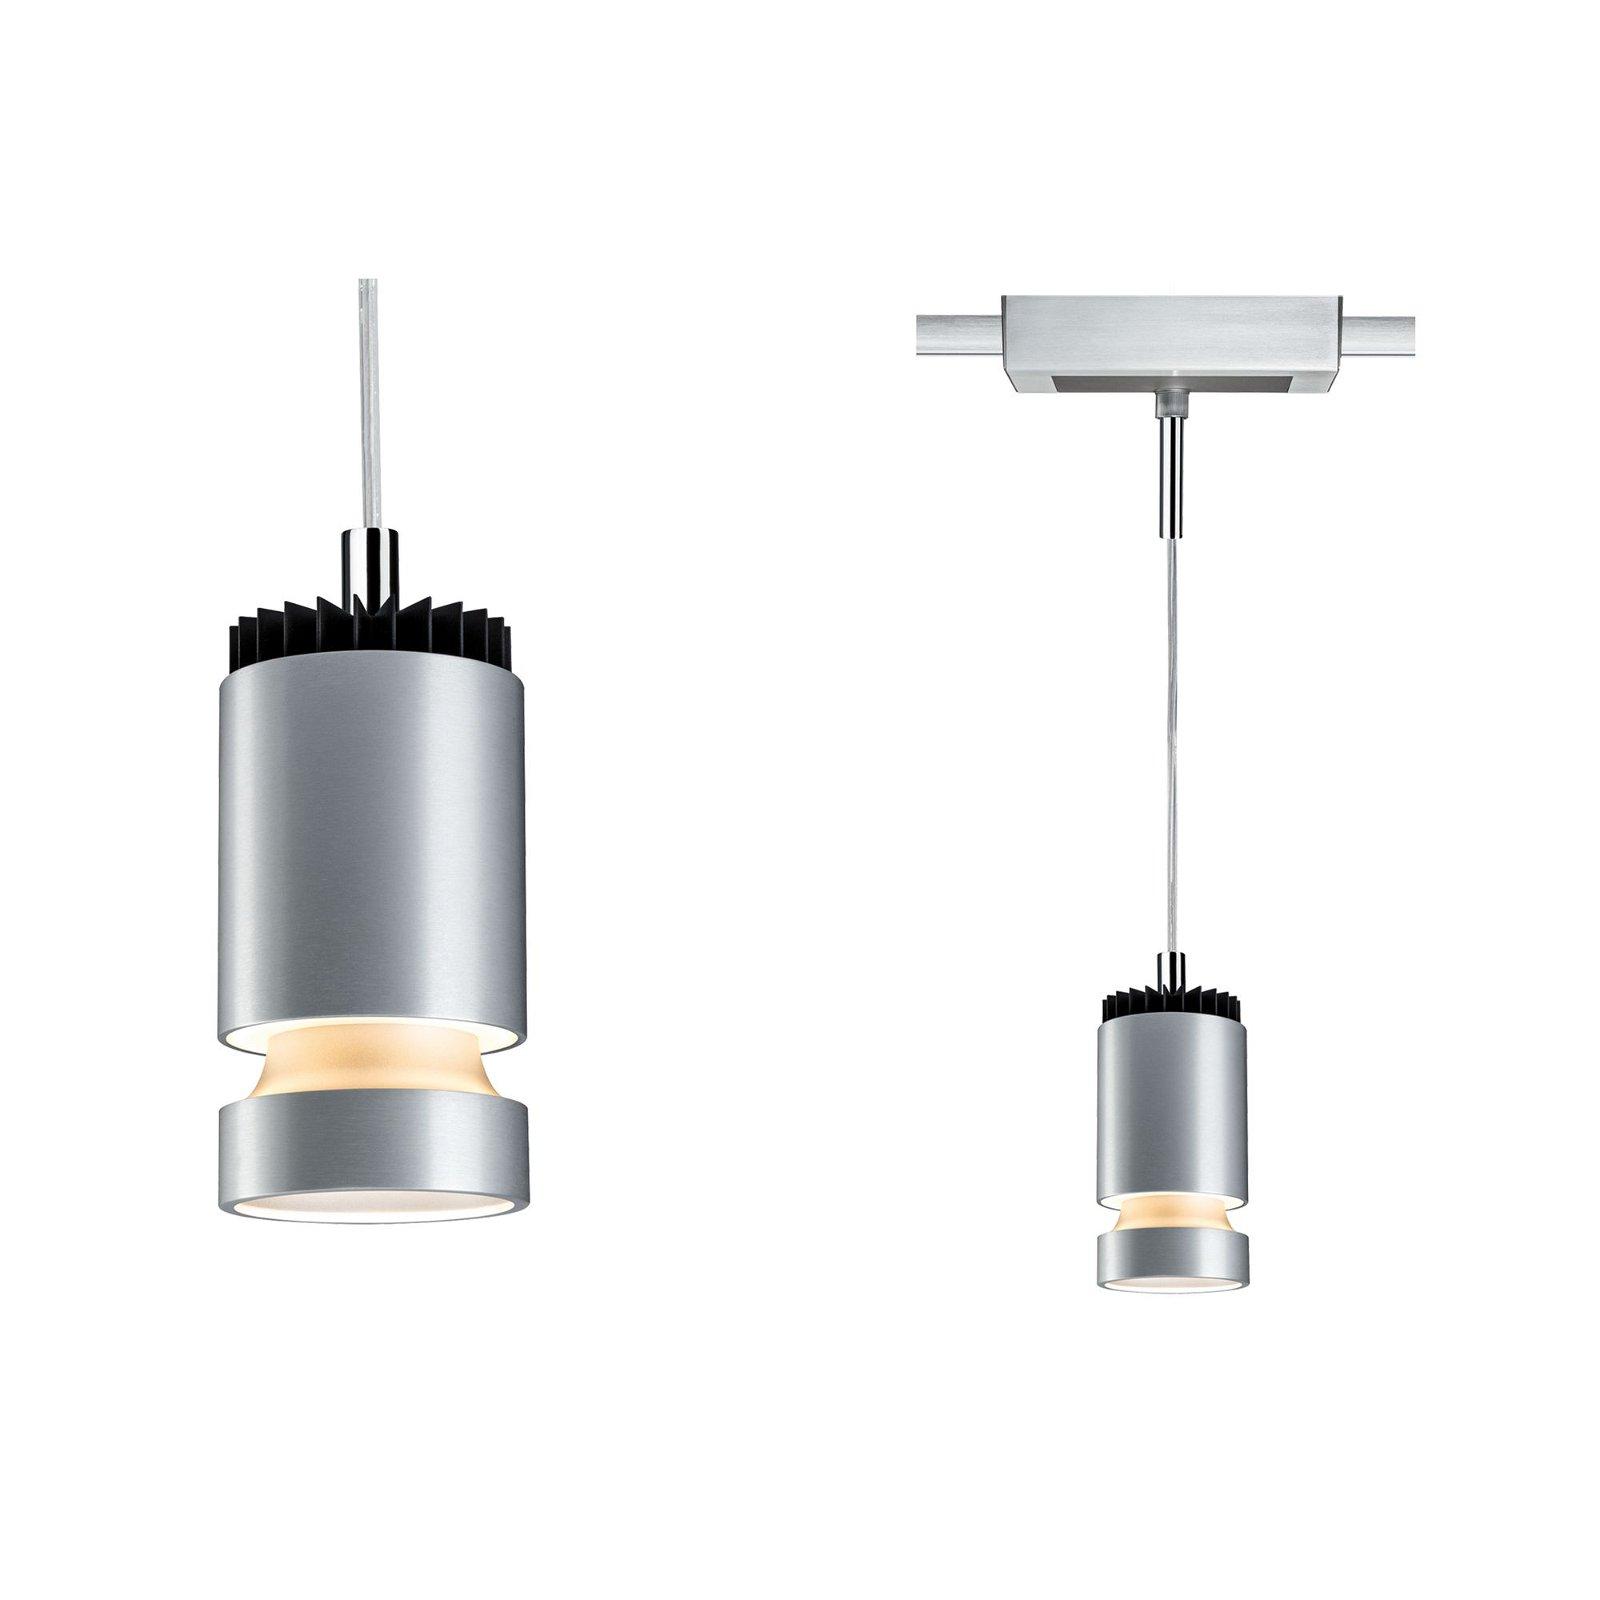 VariLine LED Pendel Shine 10 / 1x0,6W Alu gebürstet